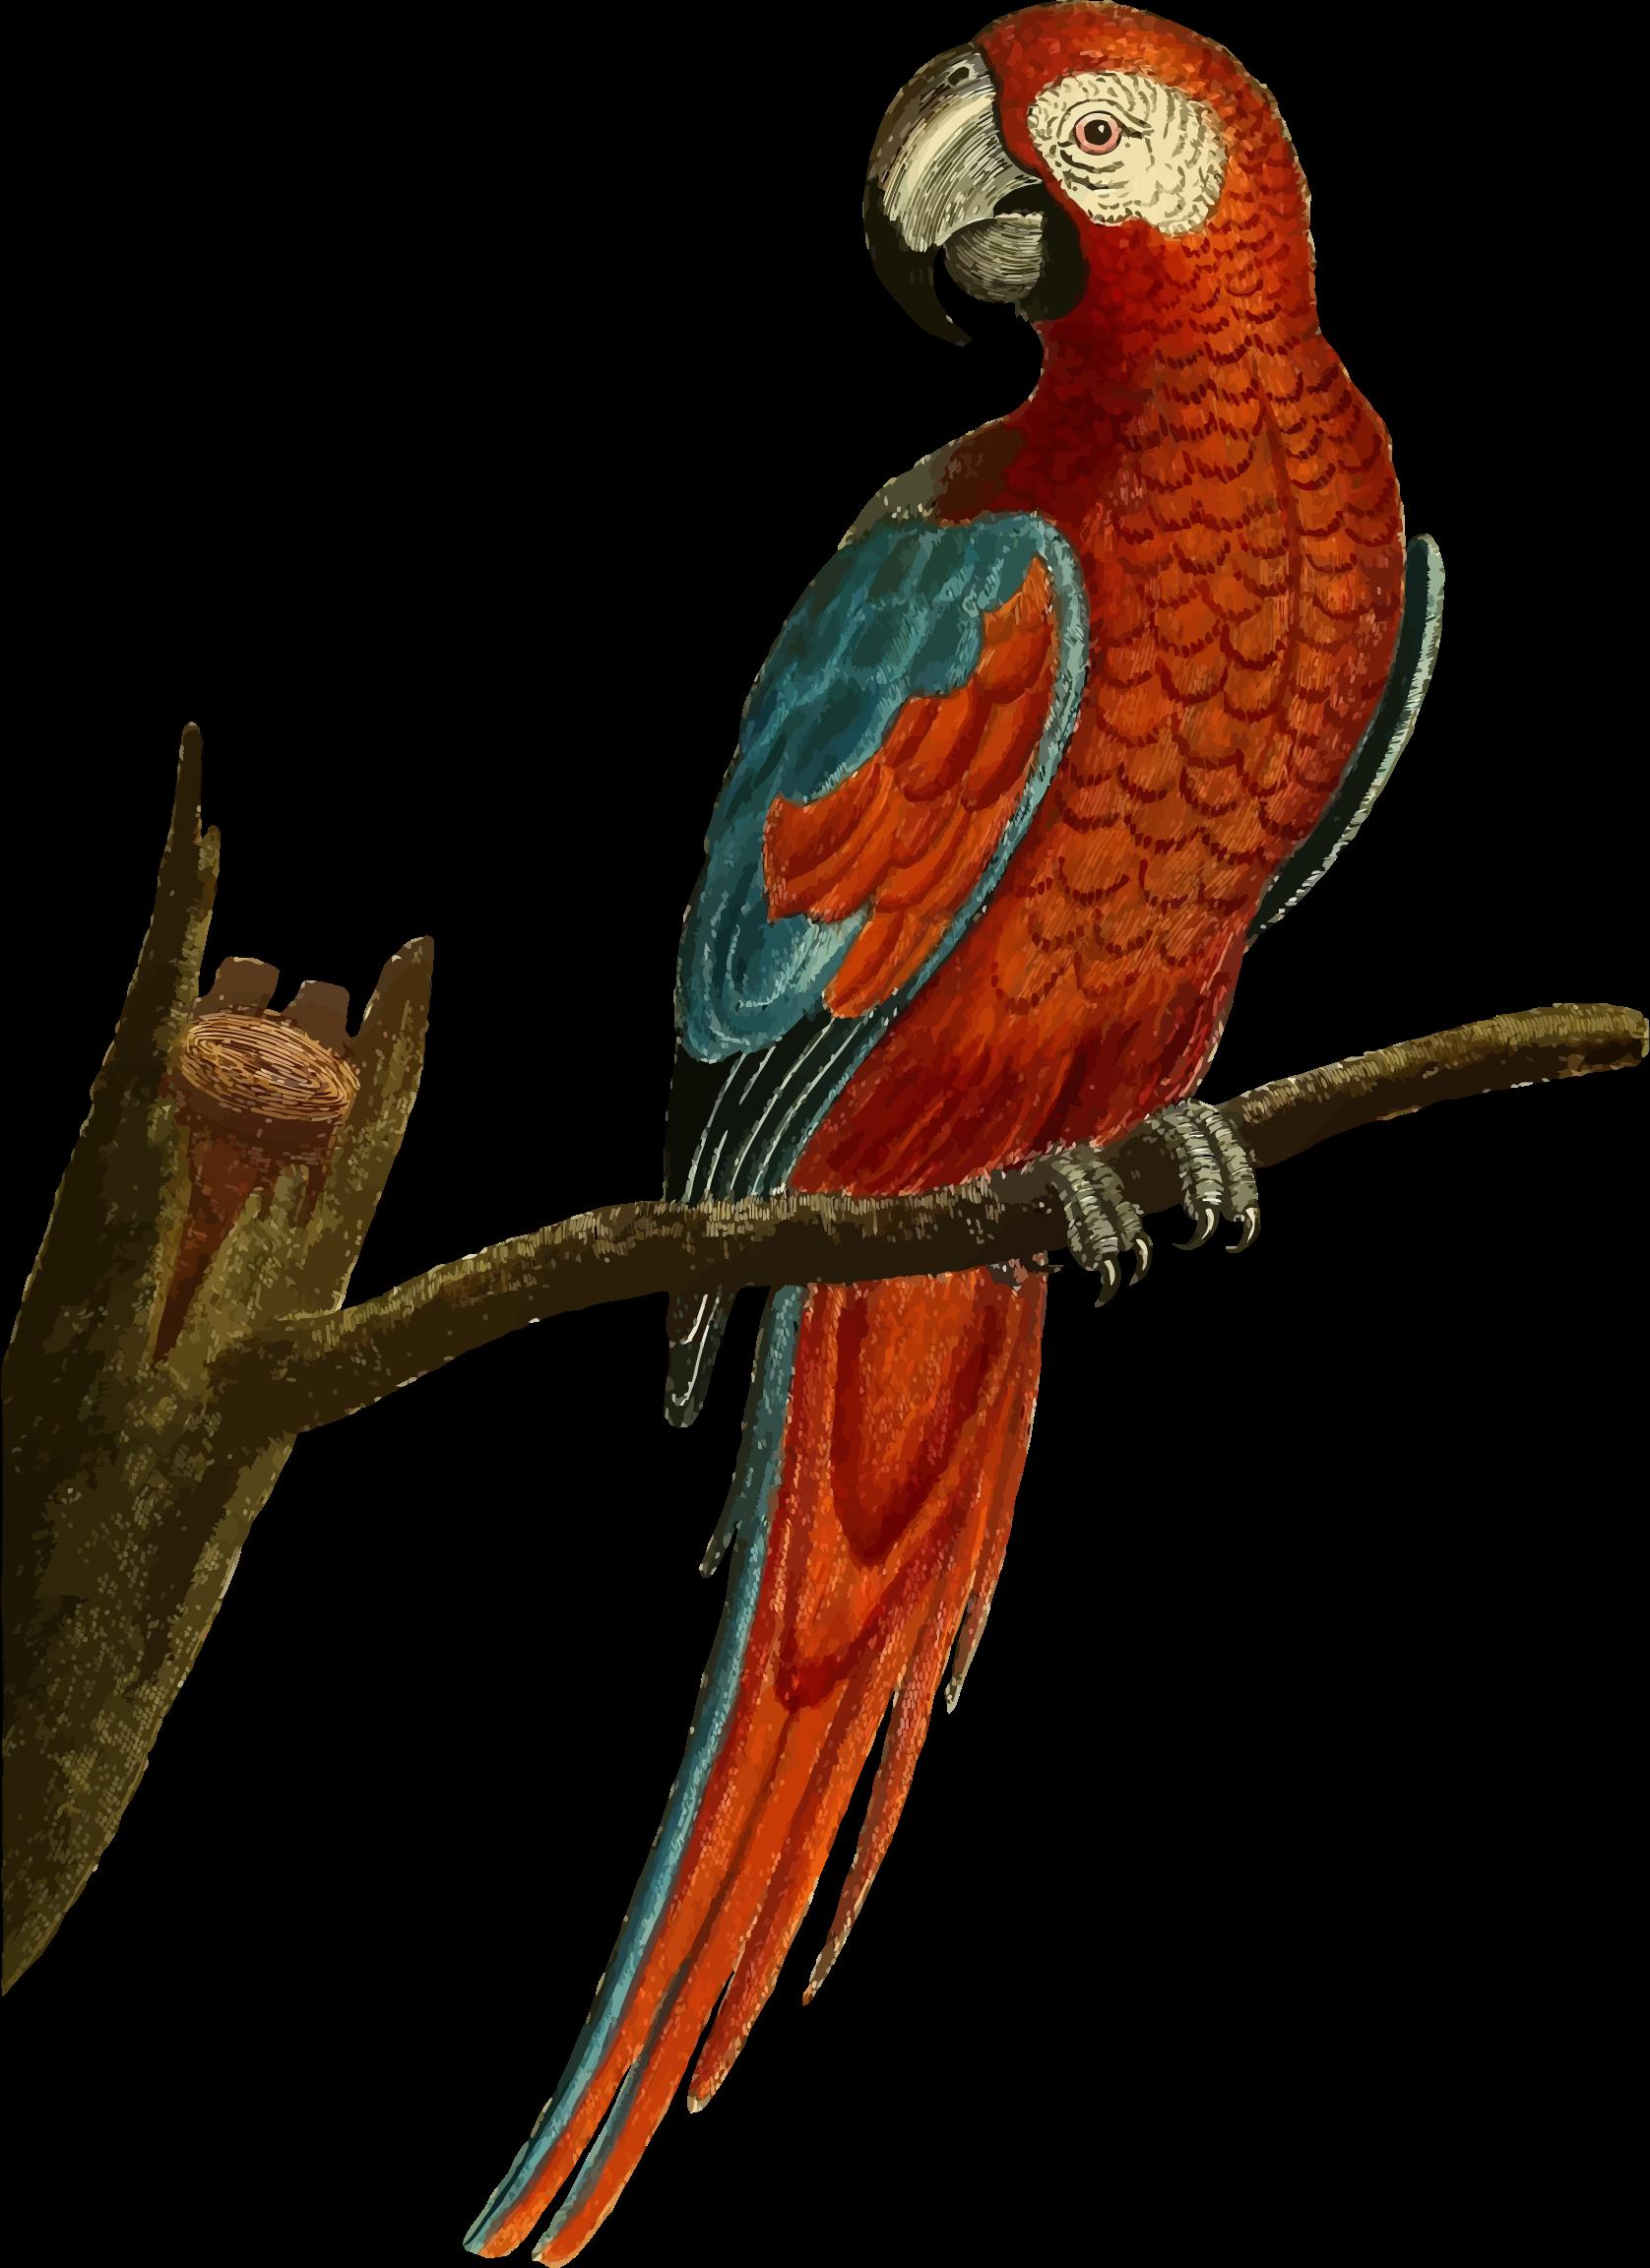 Deep red parrot illustration. Clipart bird vintage